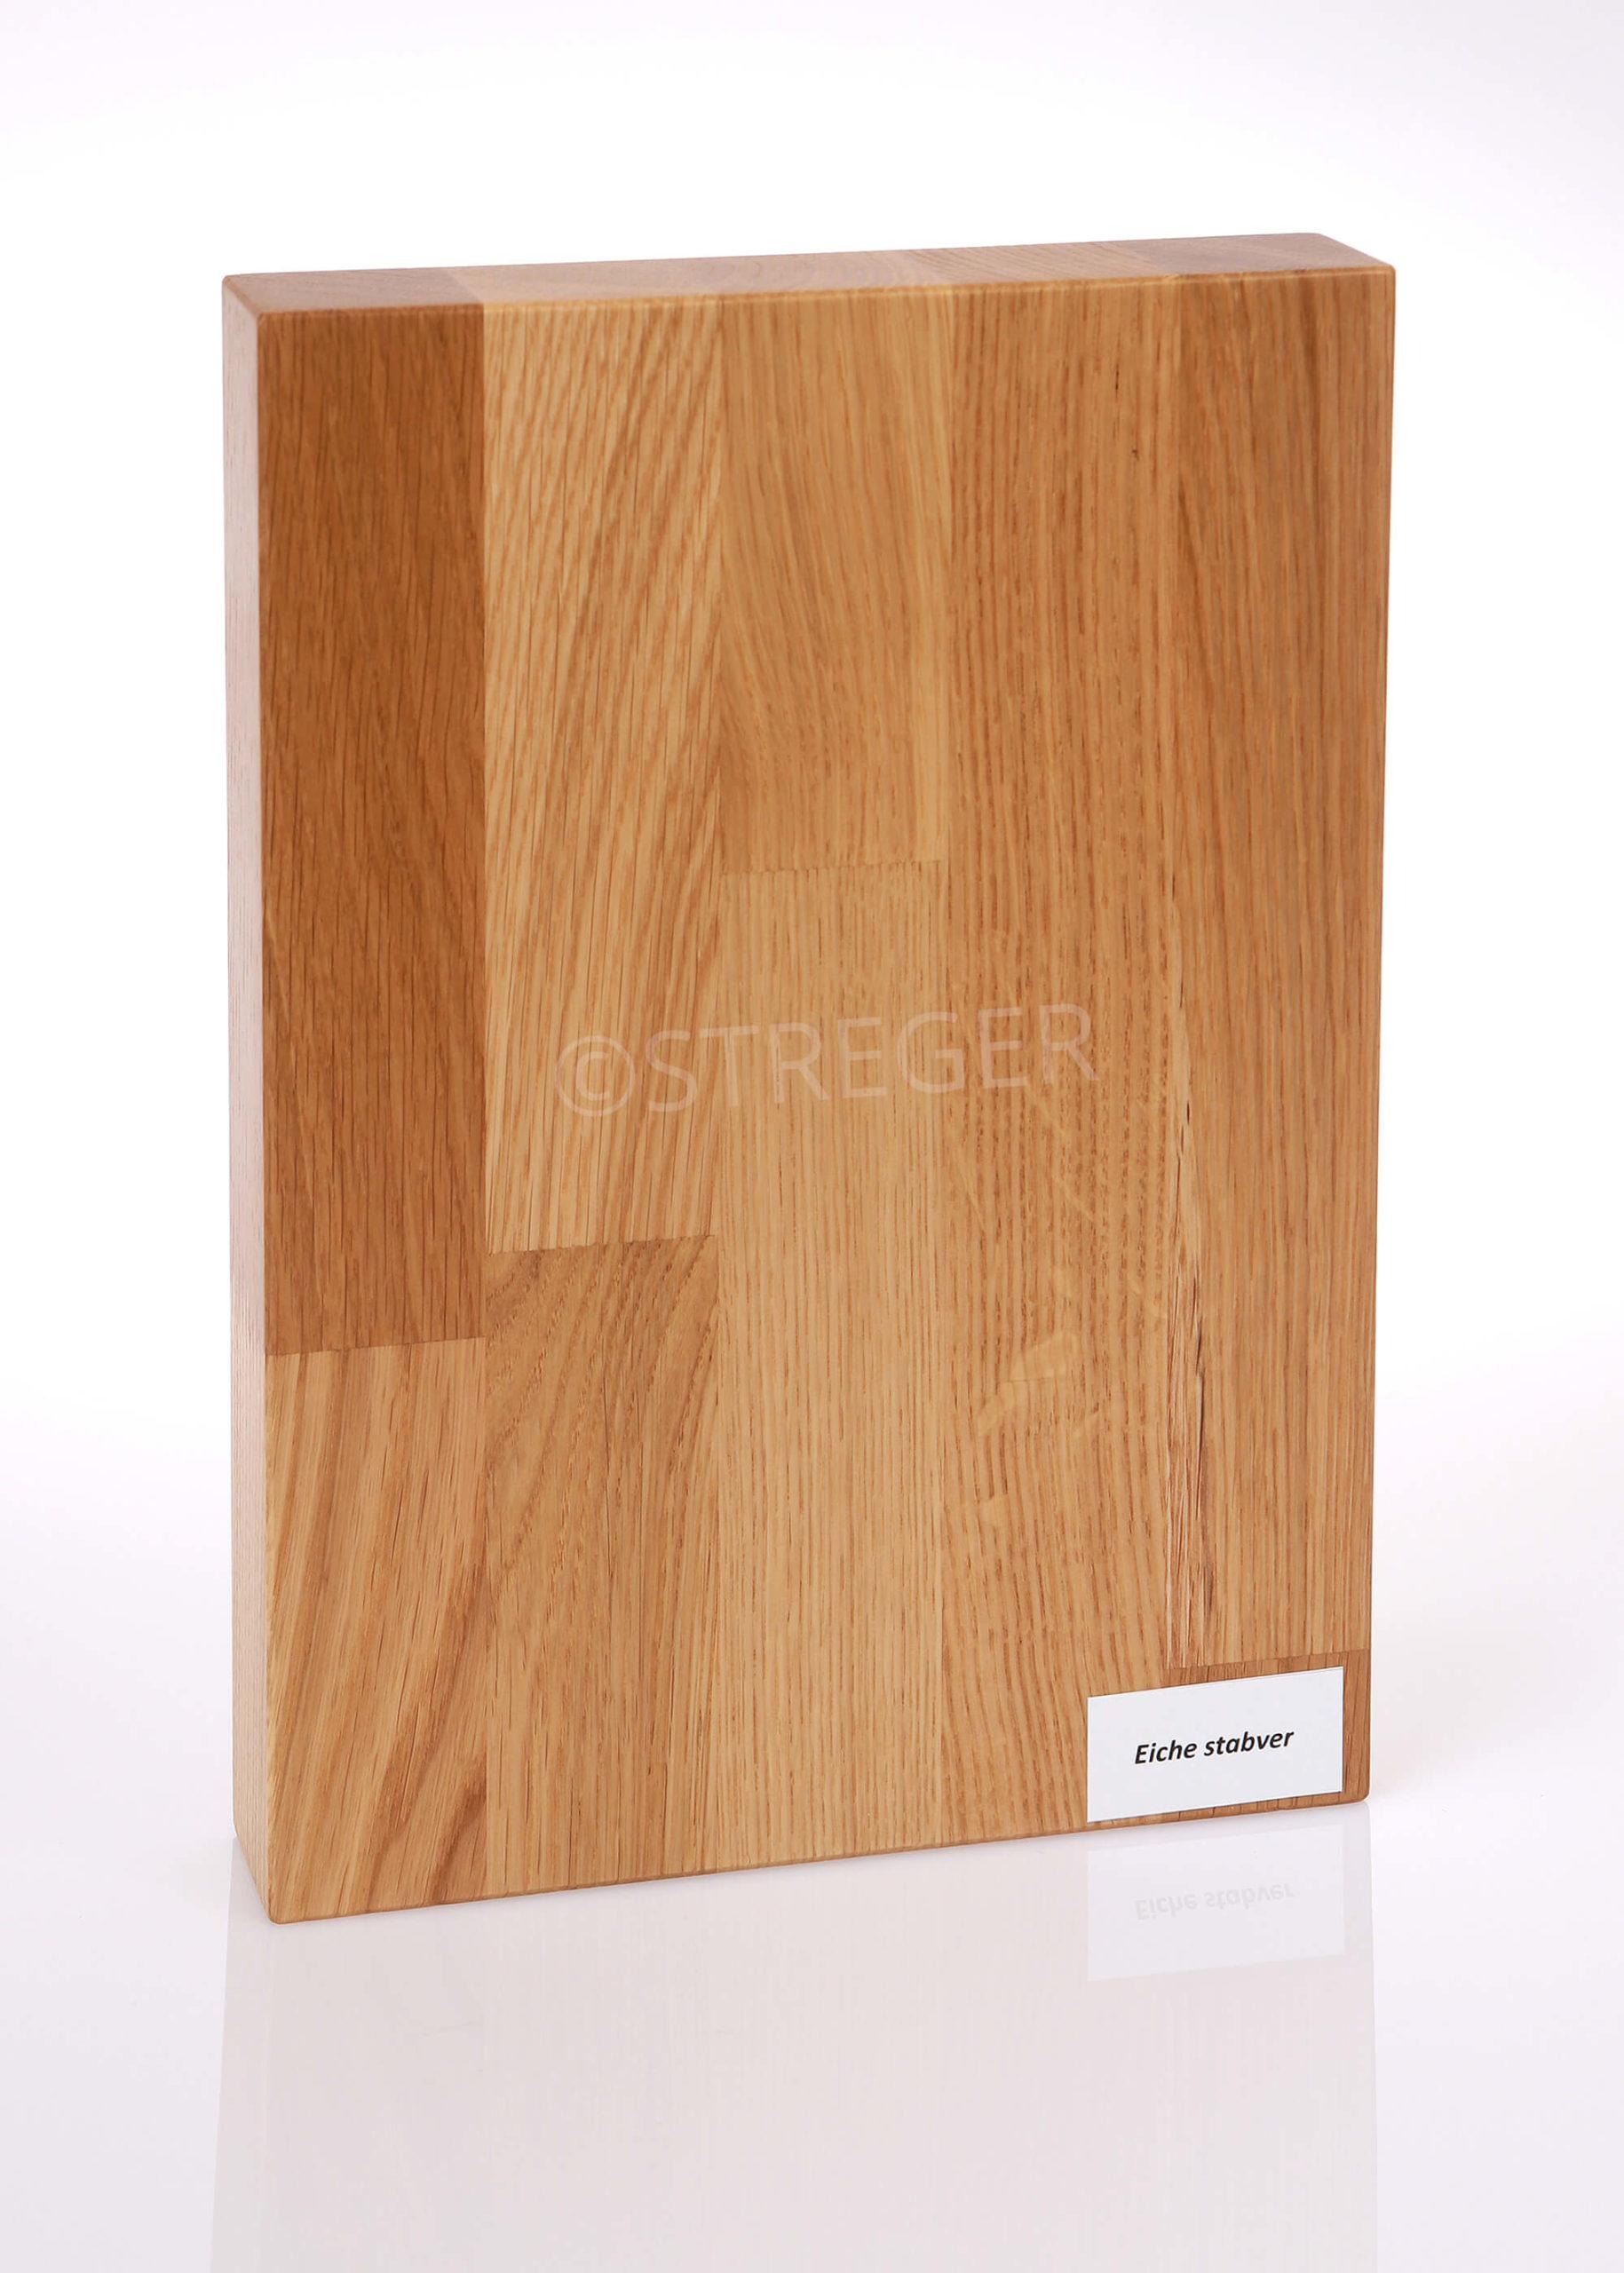 STREGER-Massivholztreppen-Eiche-stabverleimt